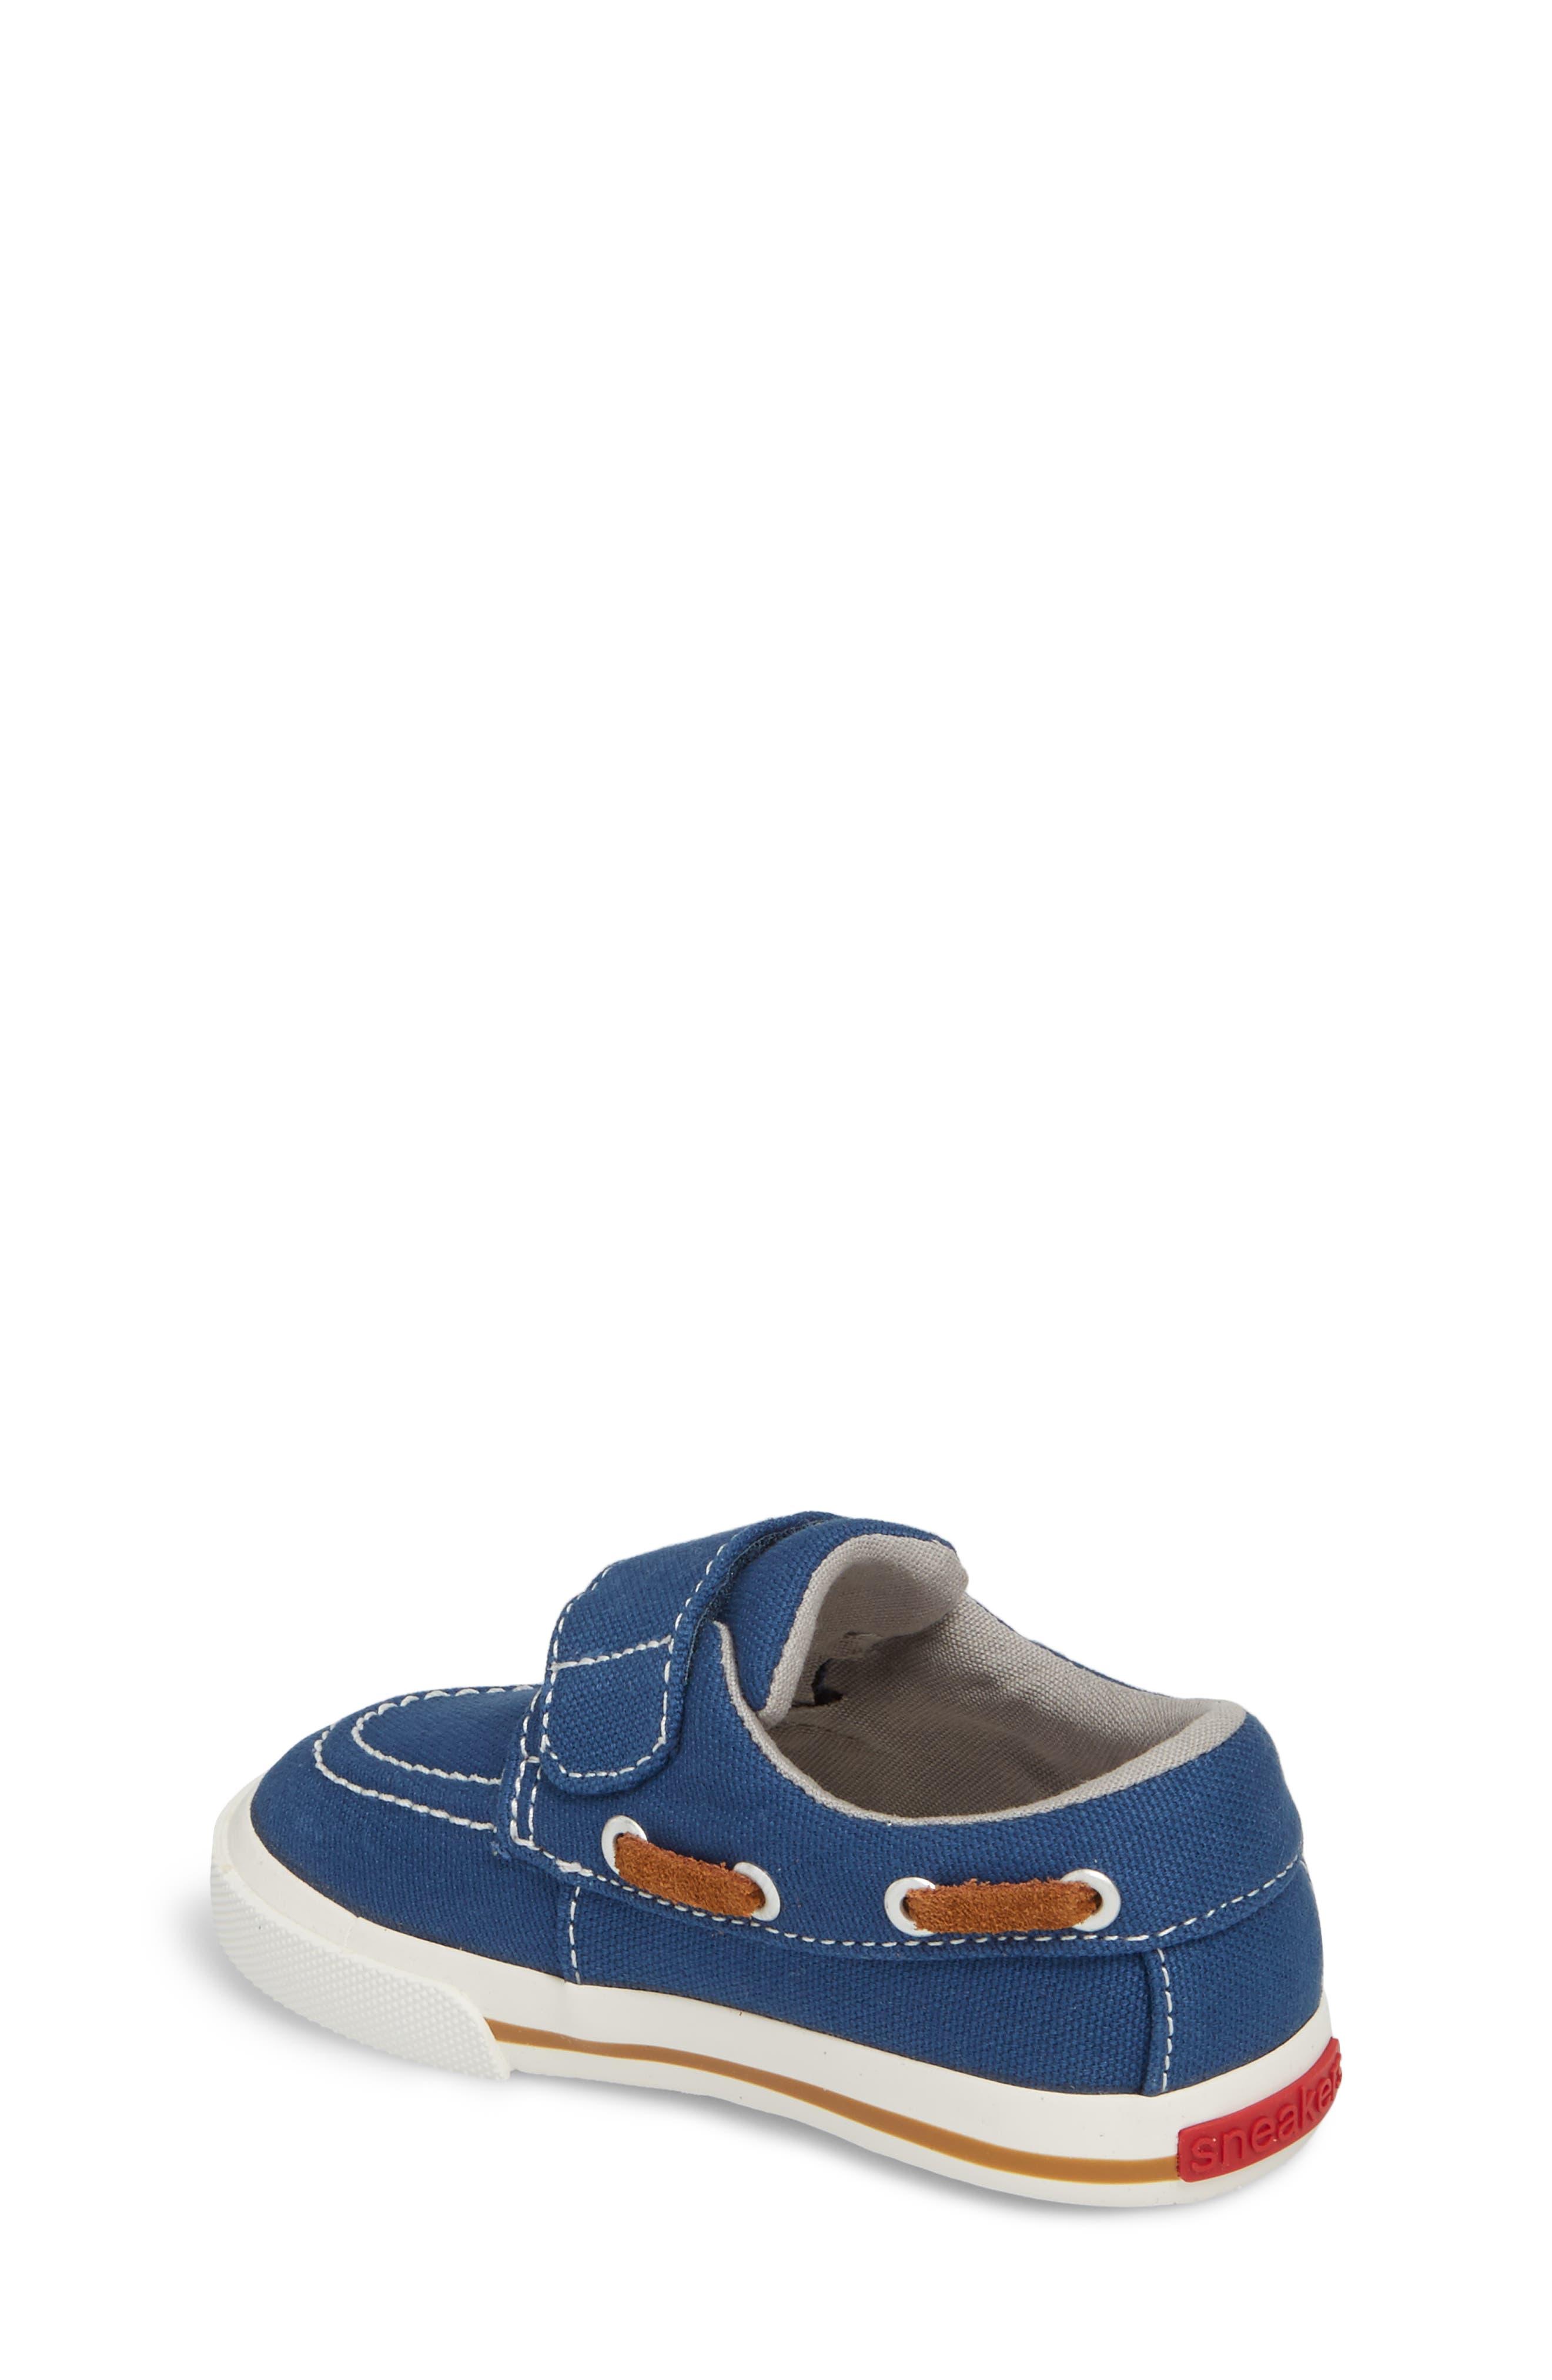 Elias Sneaker,                             Alternate thumbnail 2, color,                             Blue